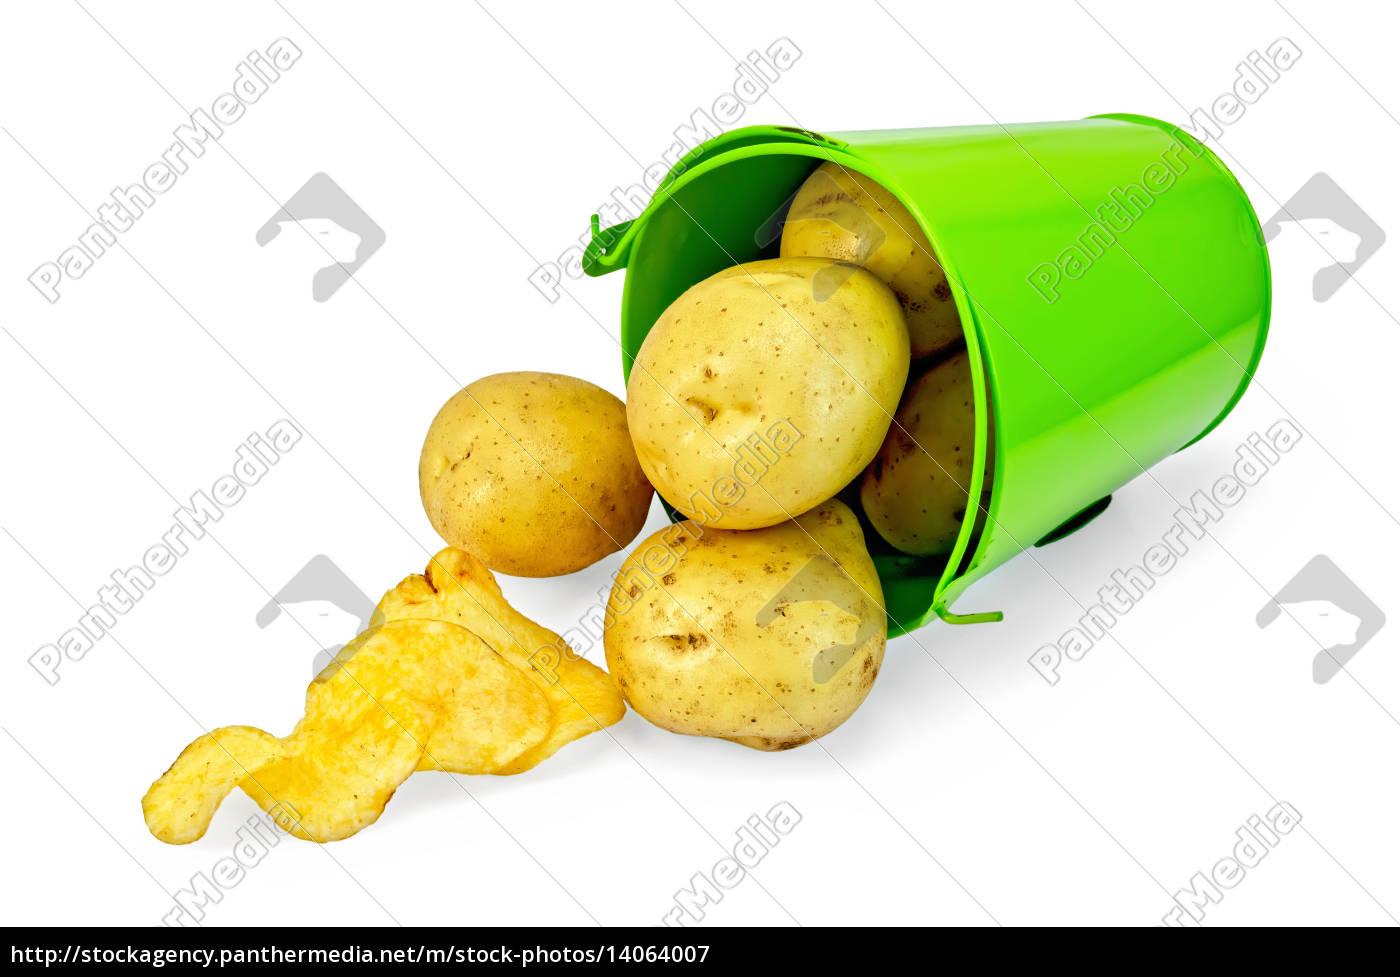 potatoes, yellow, in, a, green, bucket - 14064007